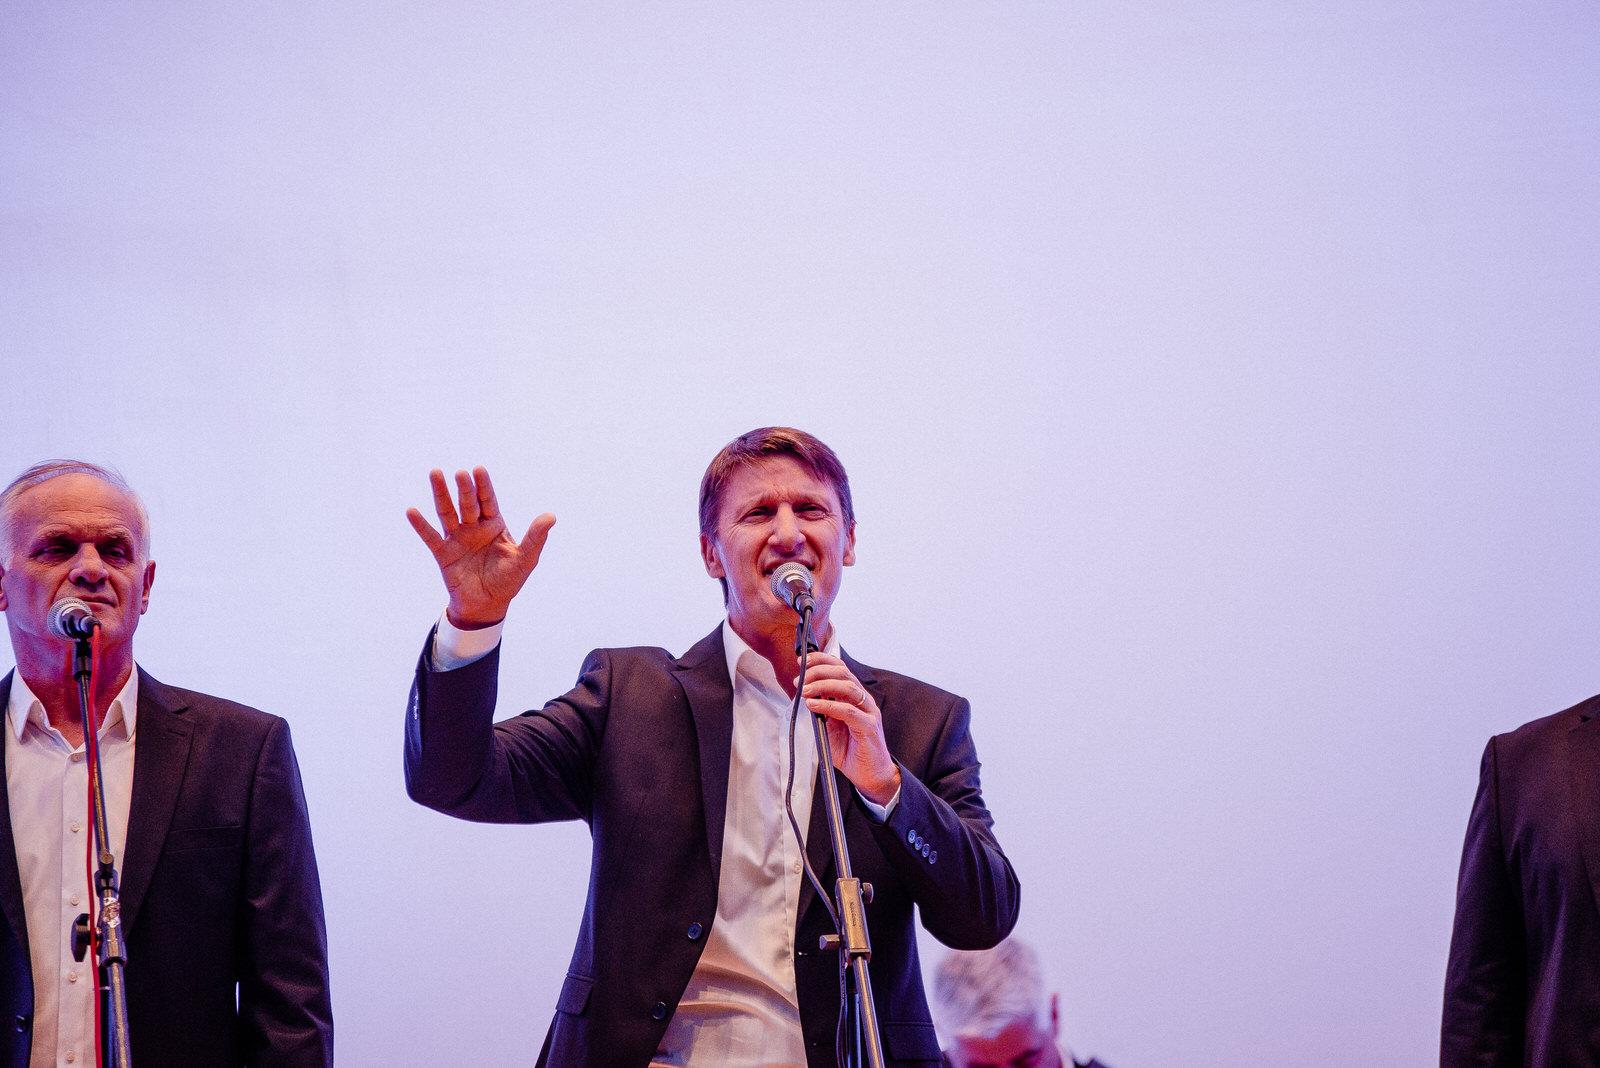 likaclub_korenica_klapa-intrade_dan-neovisnosti_2019-18